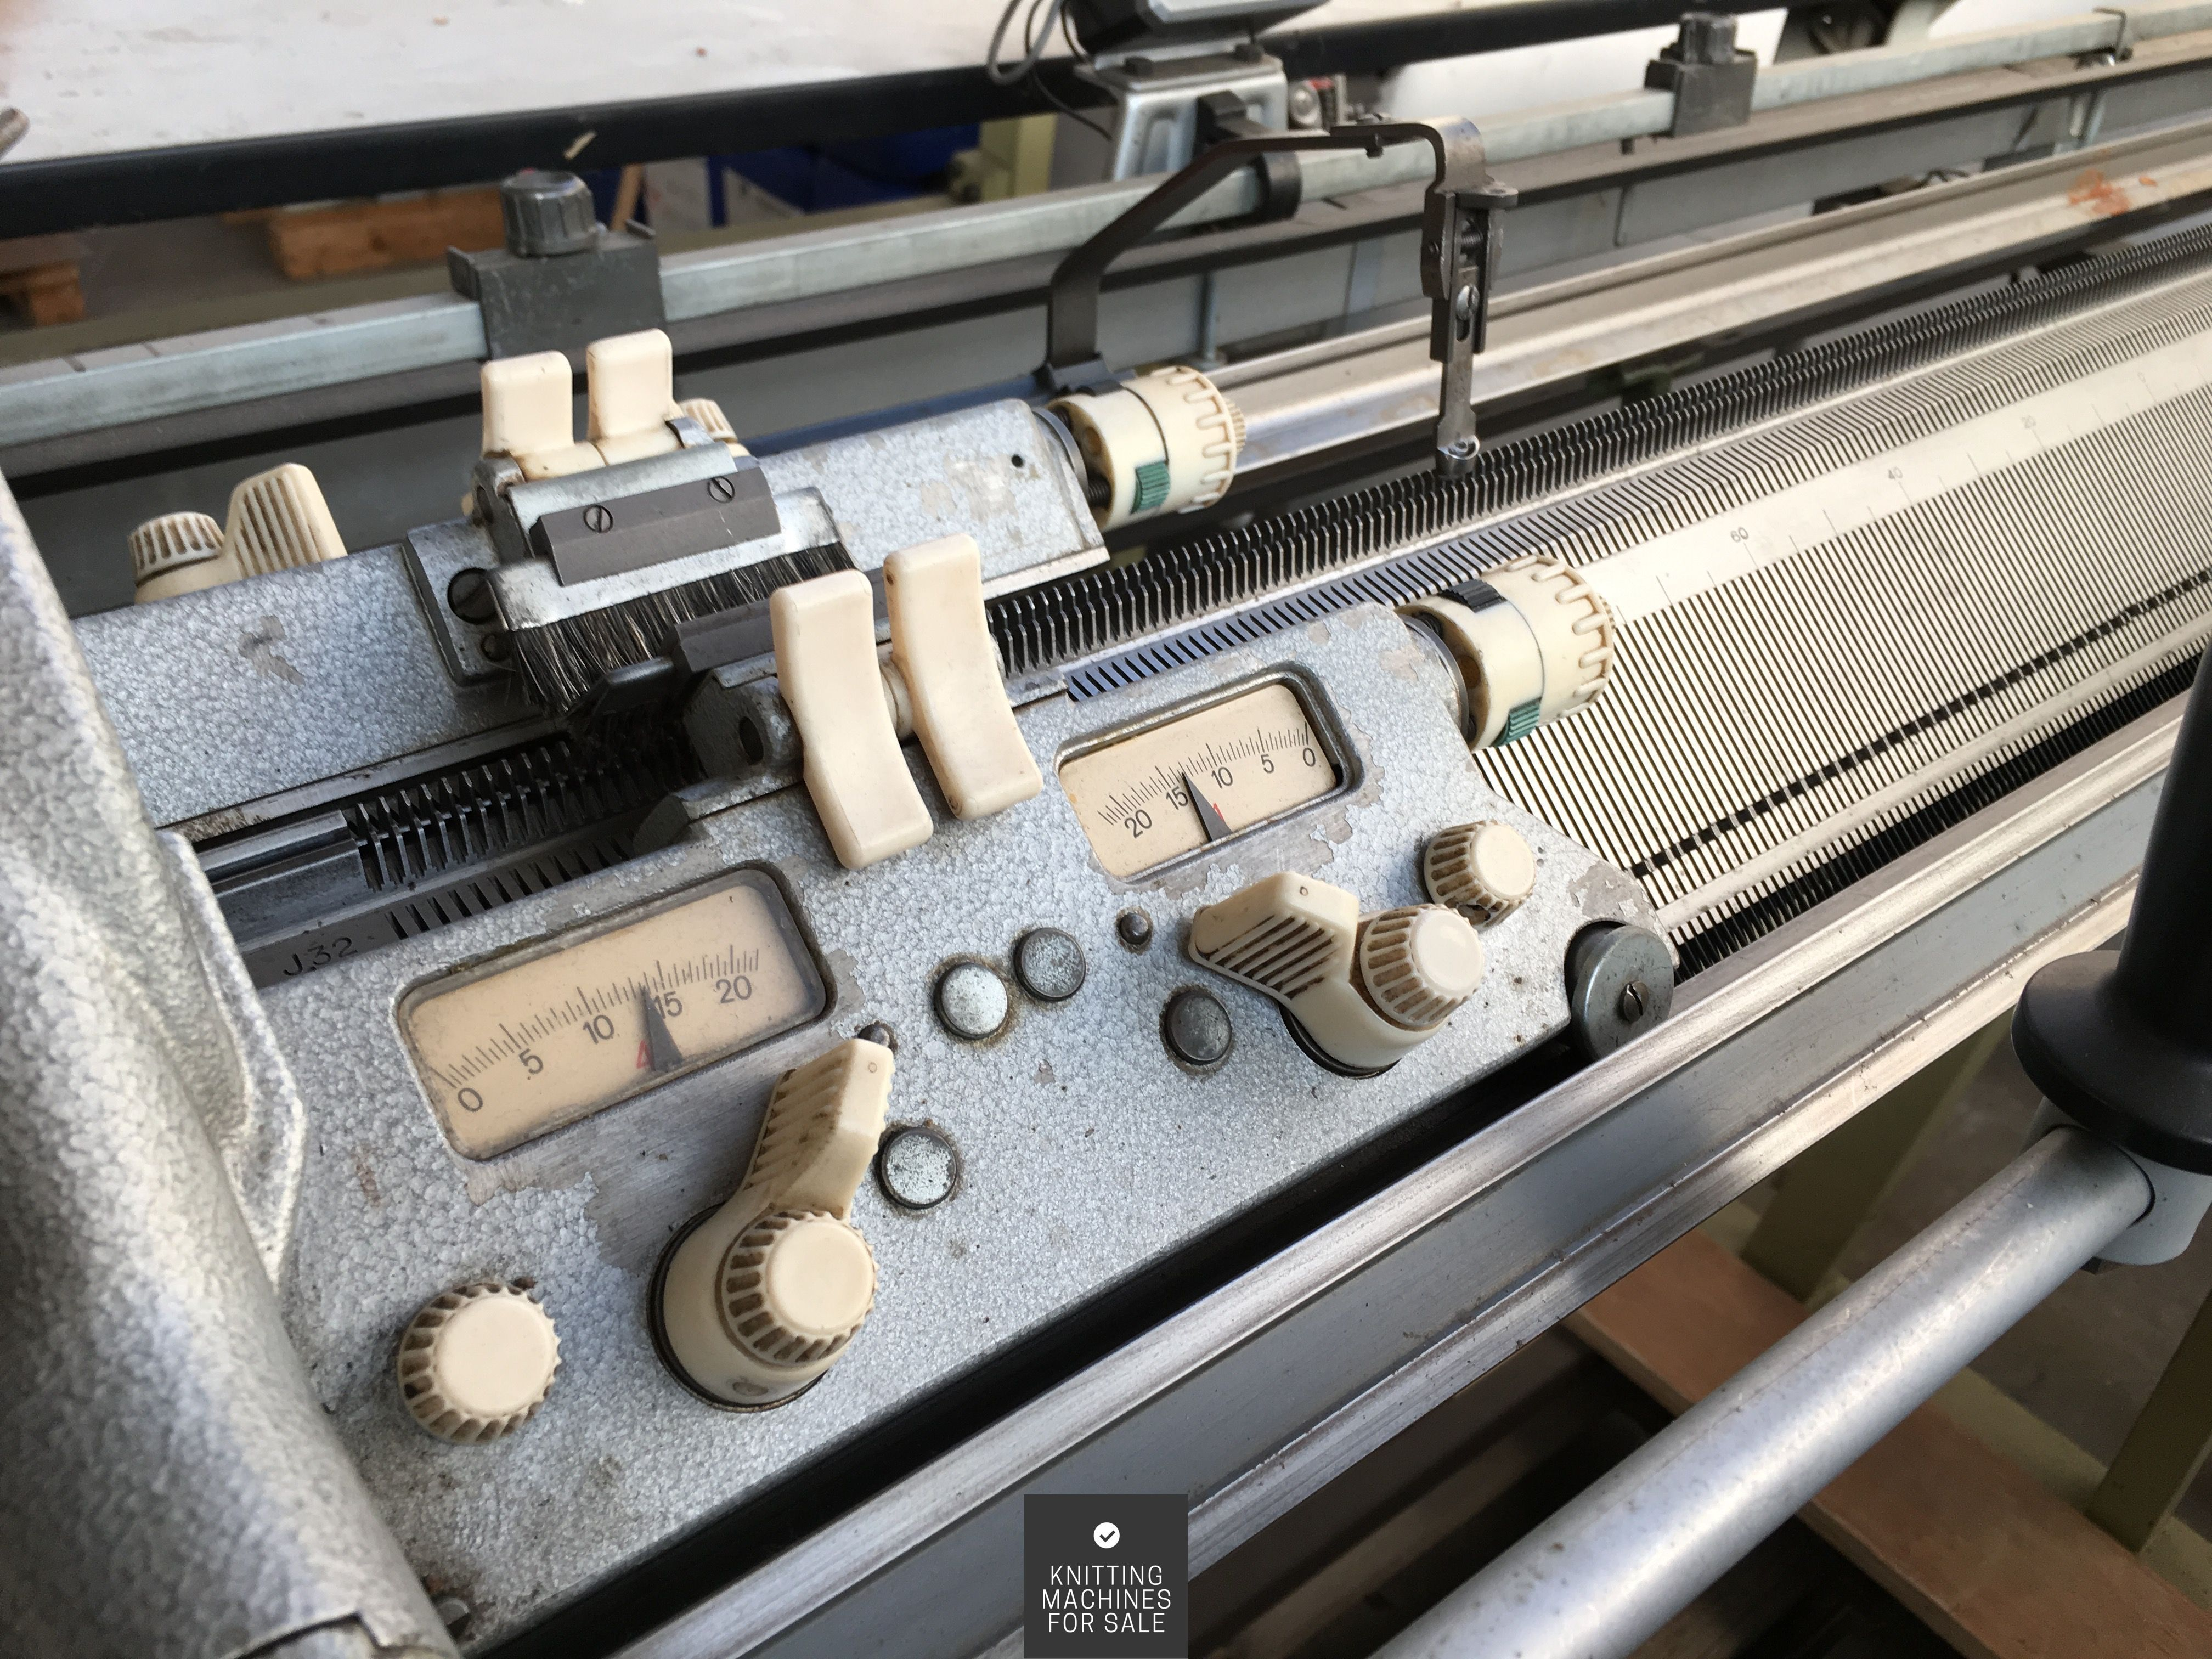 Pin By Leena On Neulekone Pinterest Knitting Machine